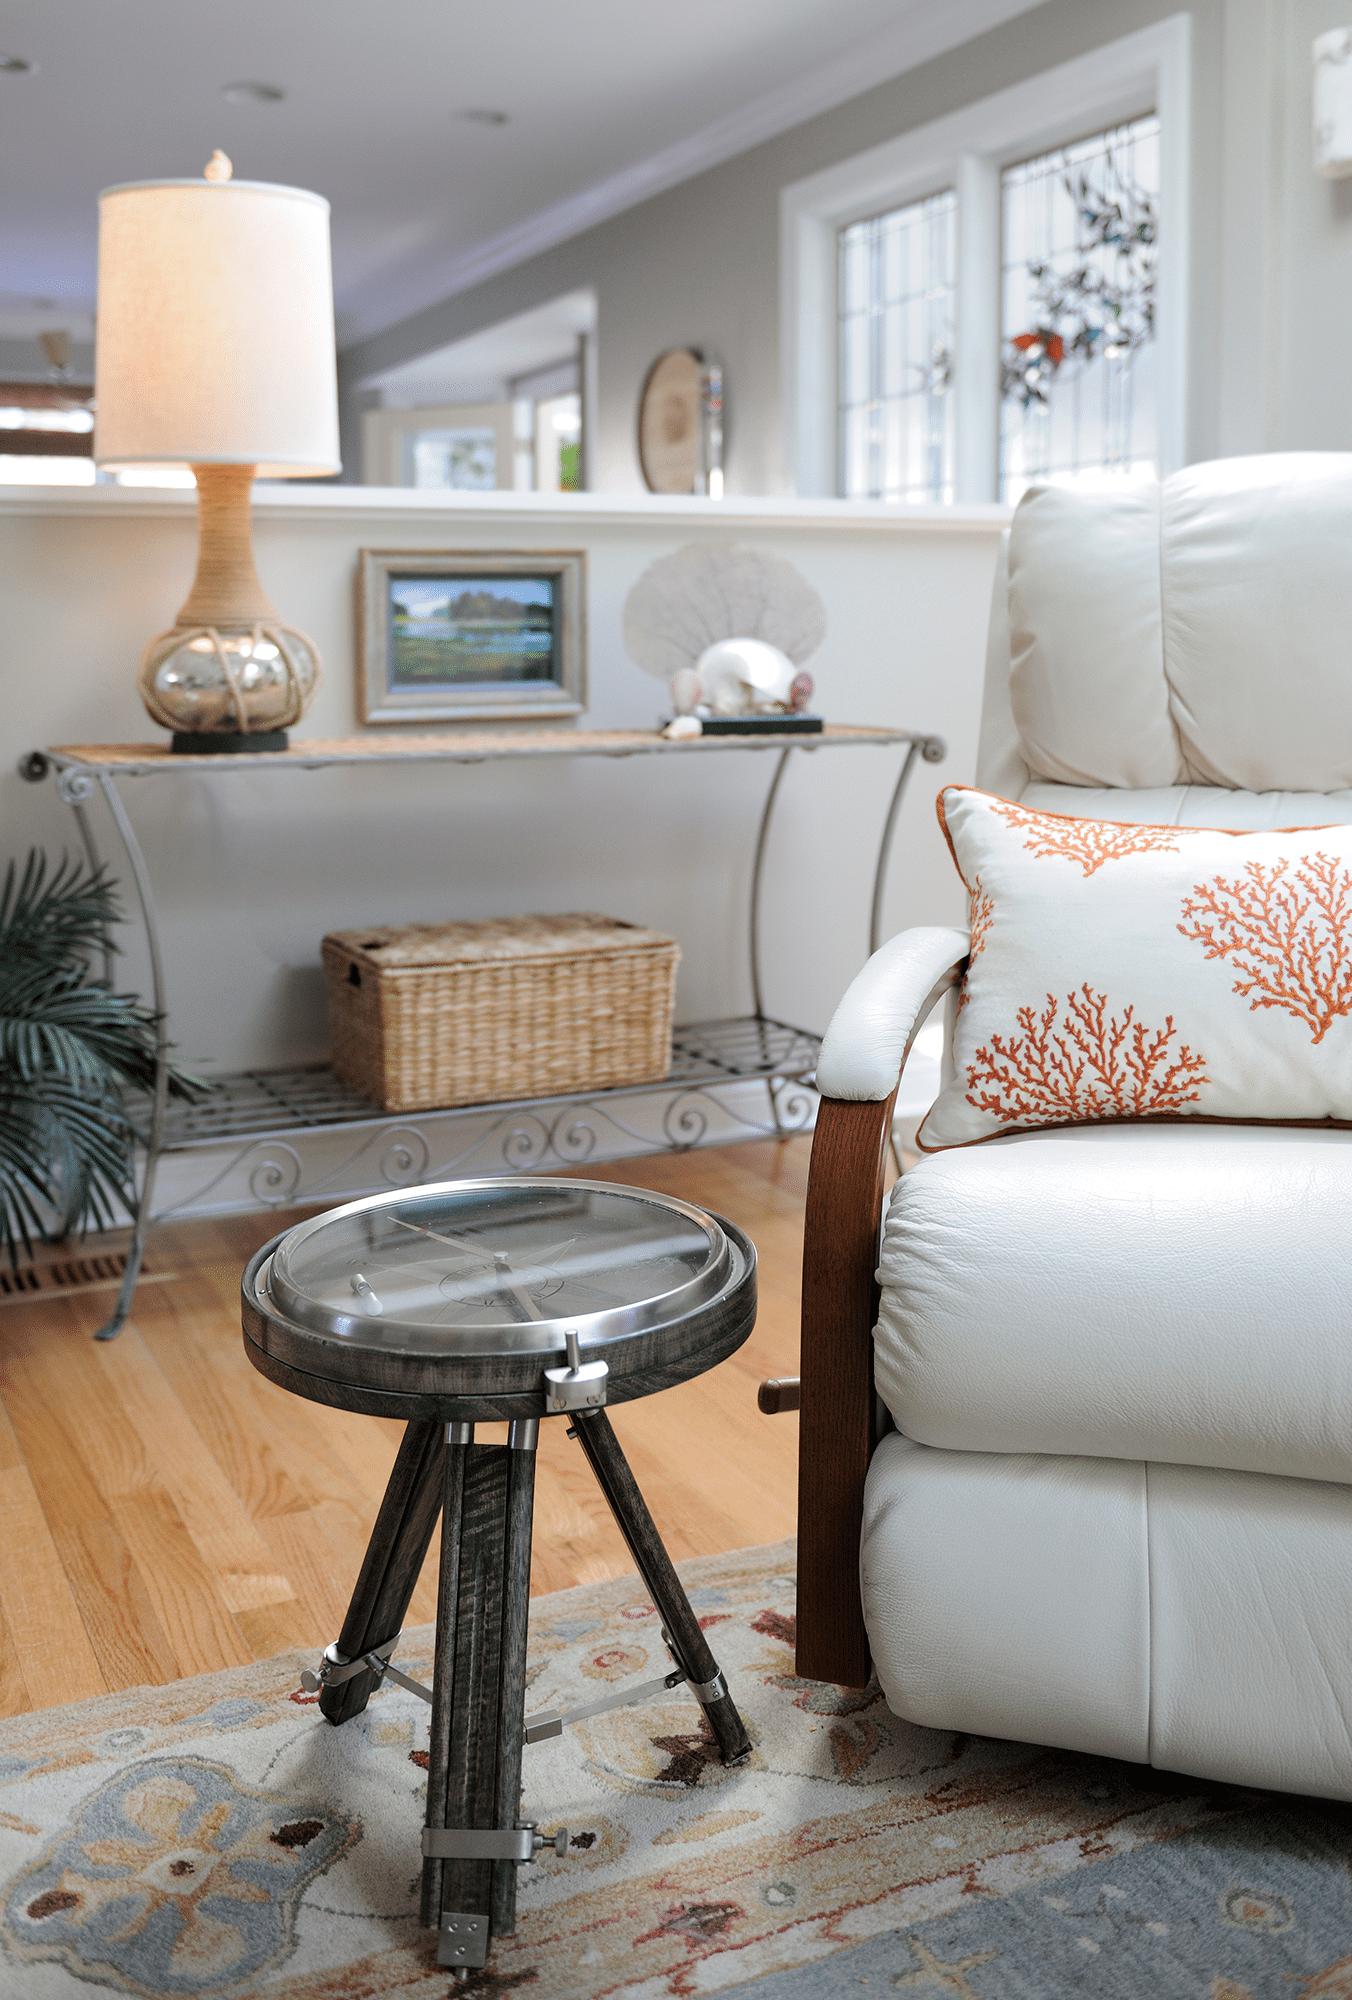 Glass-top stool near sofa